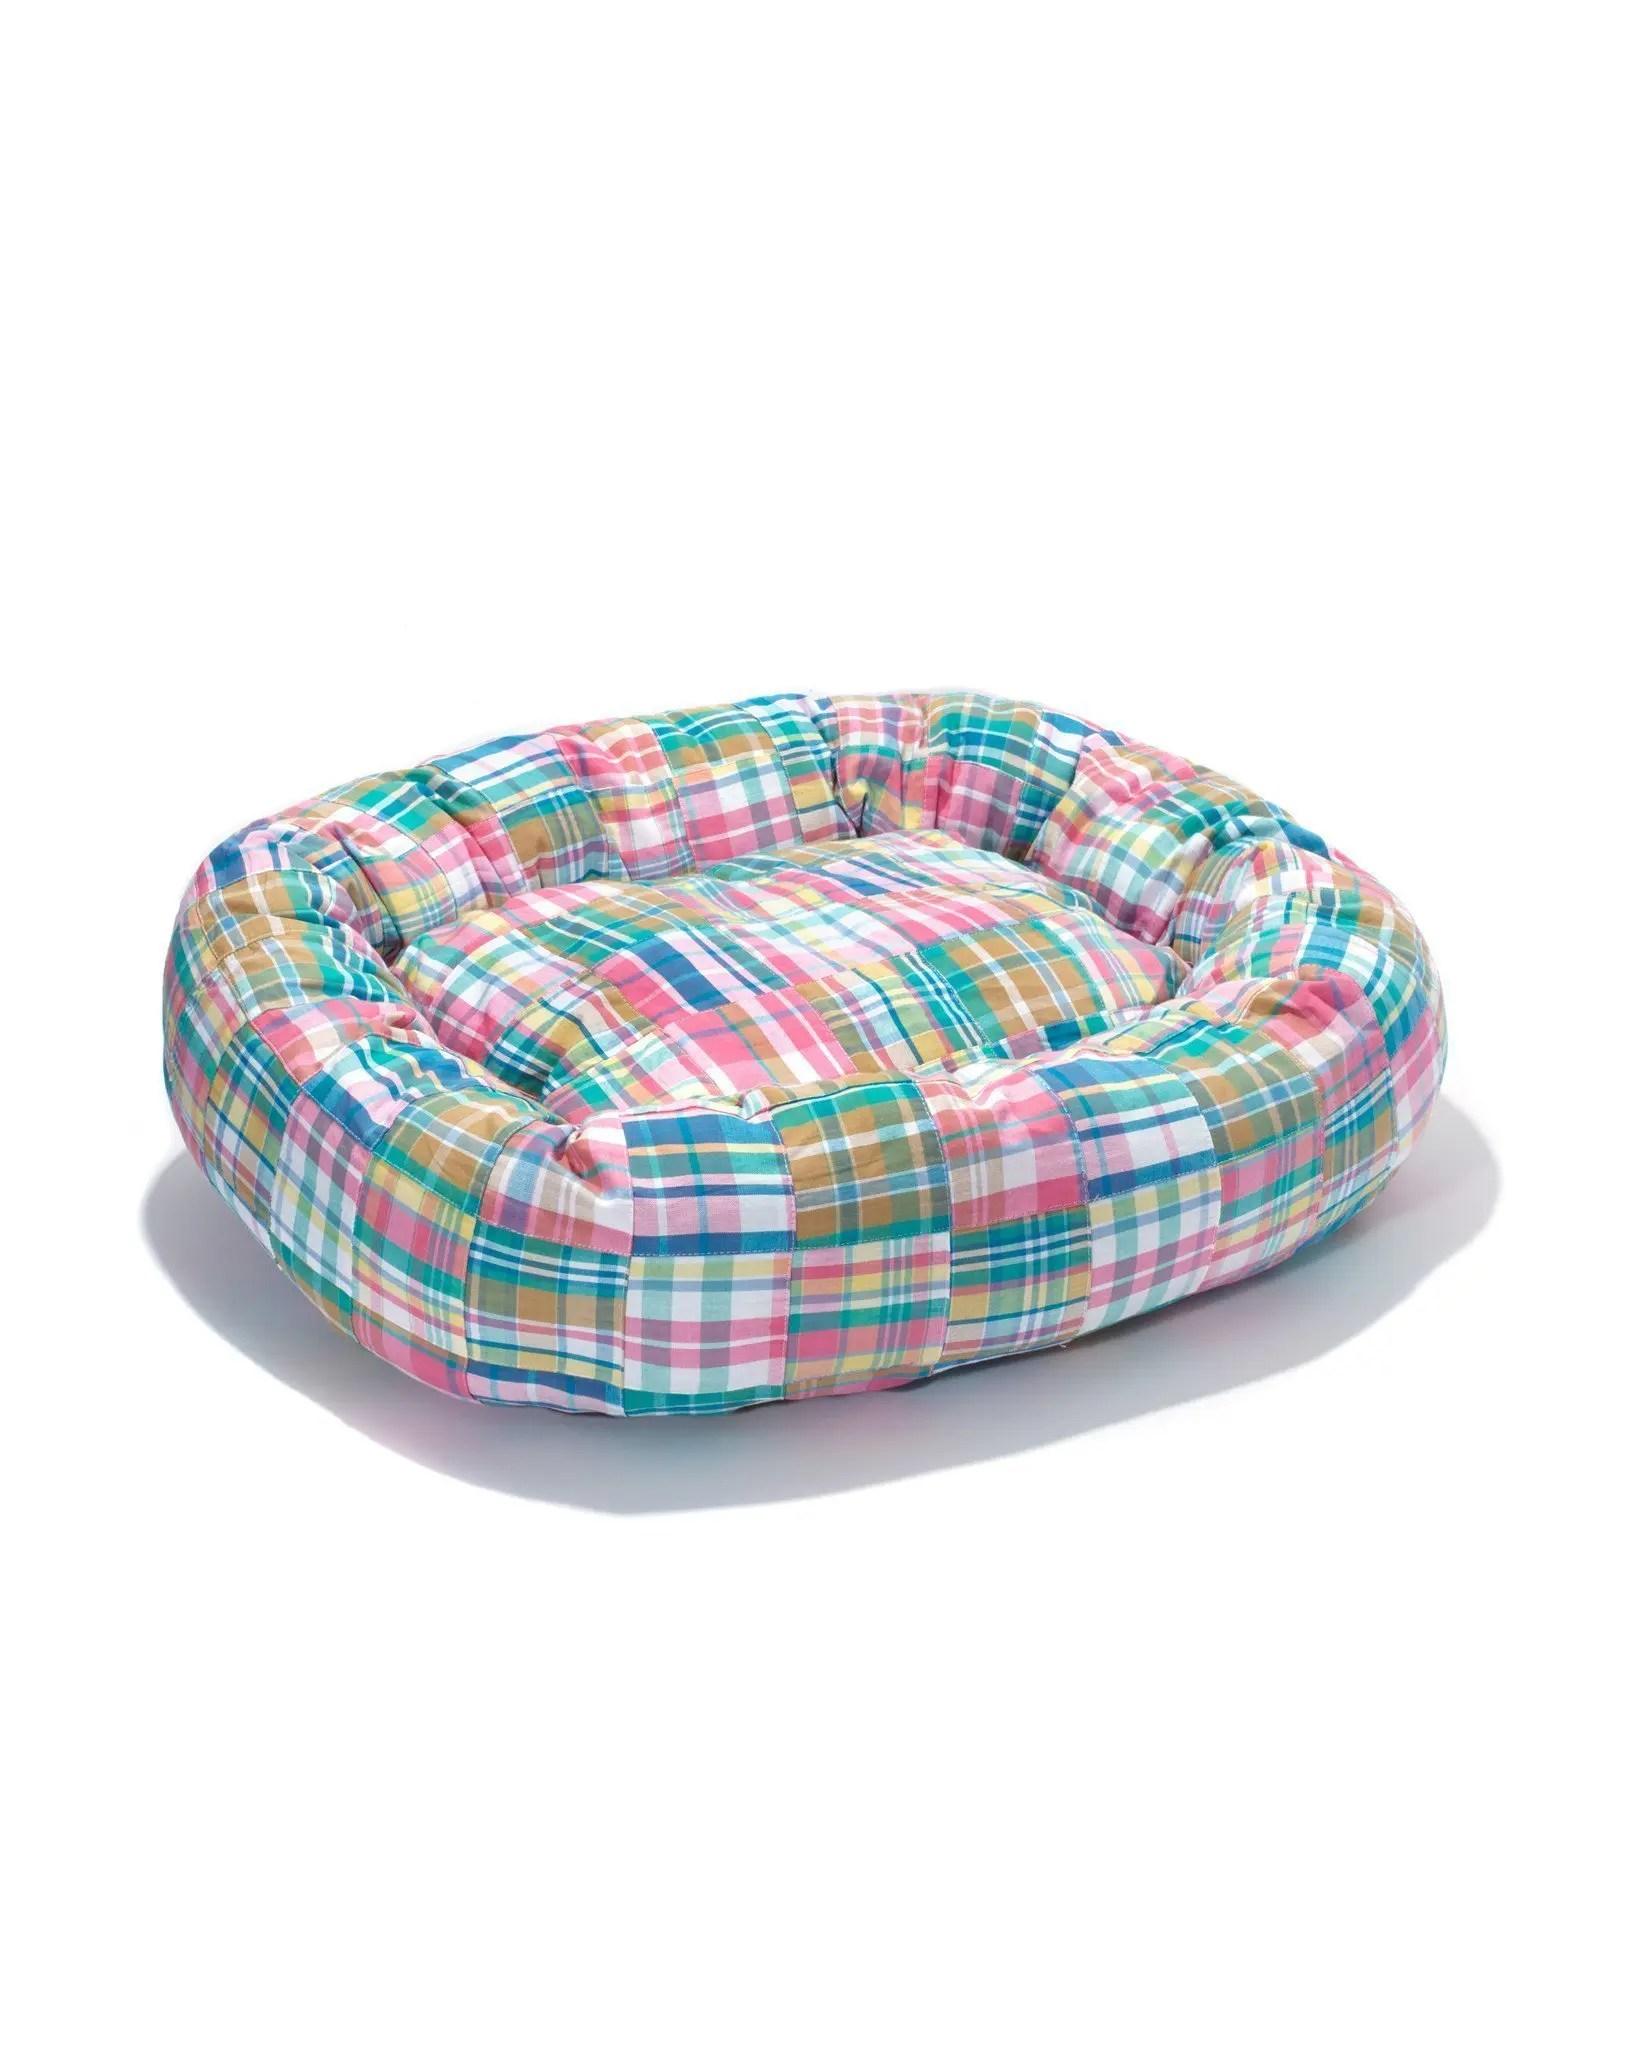 Madras Dog Bed